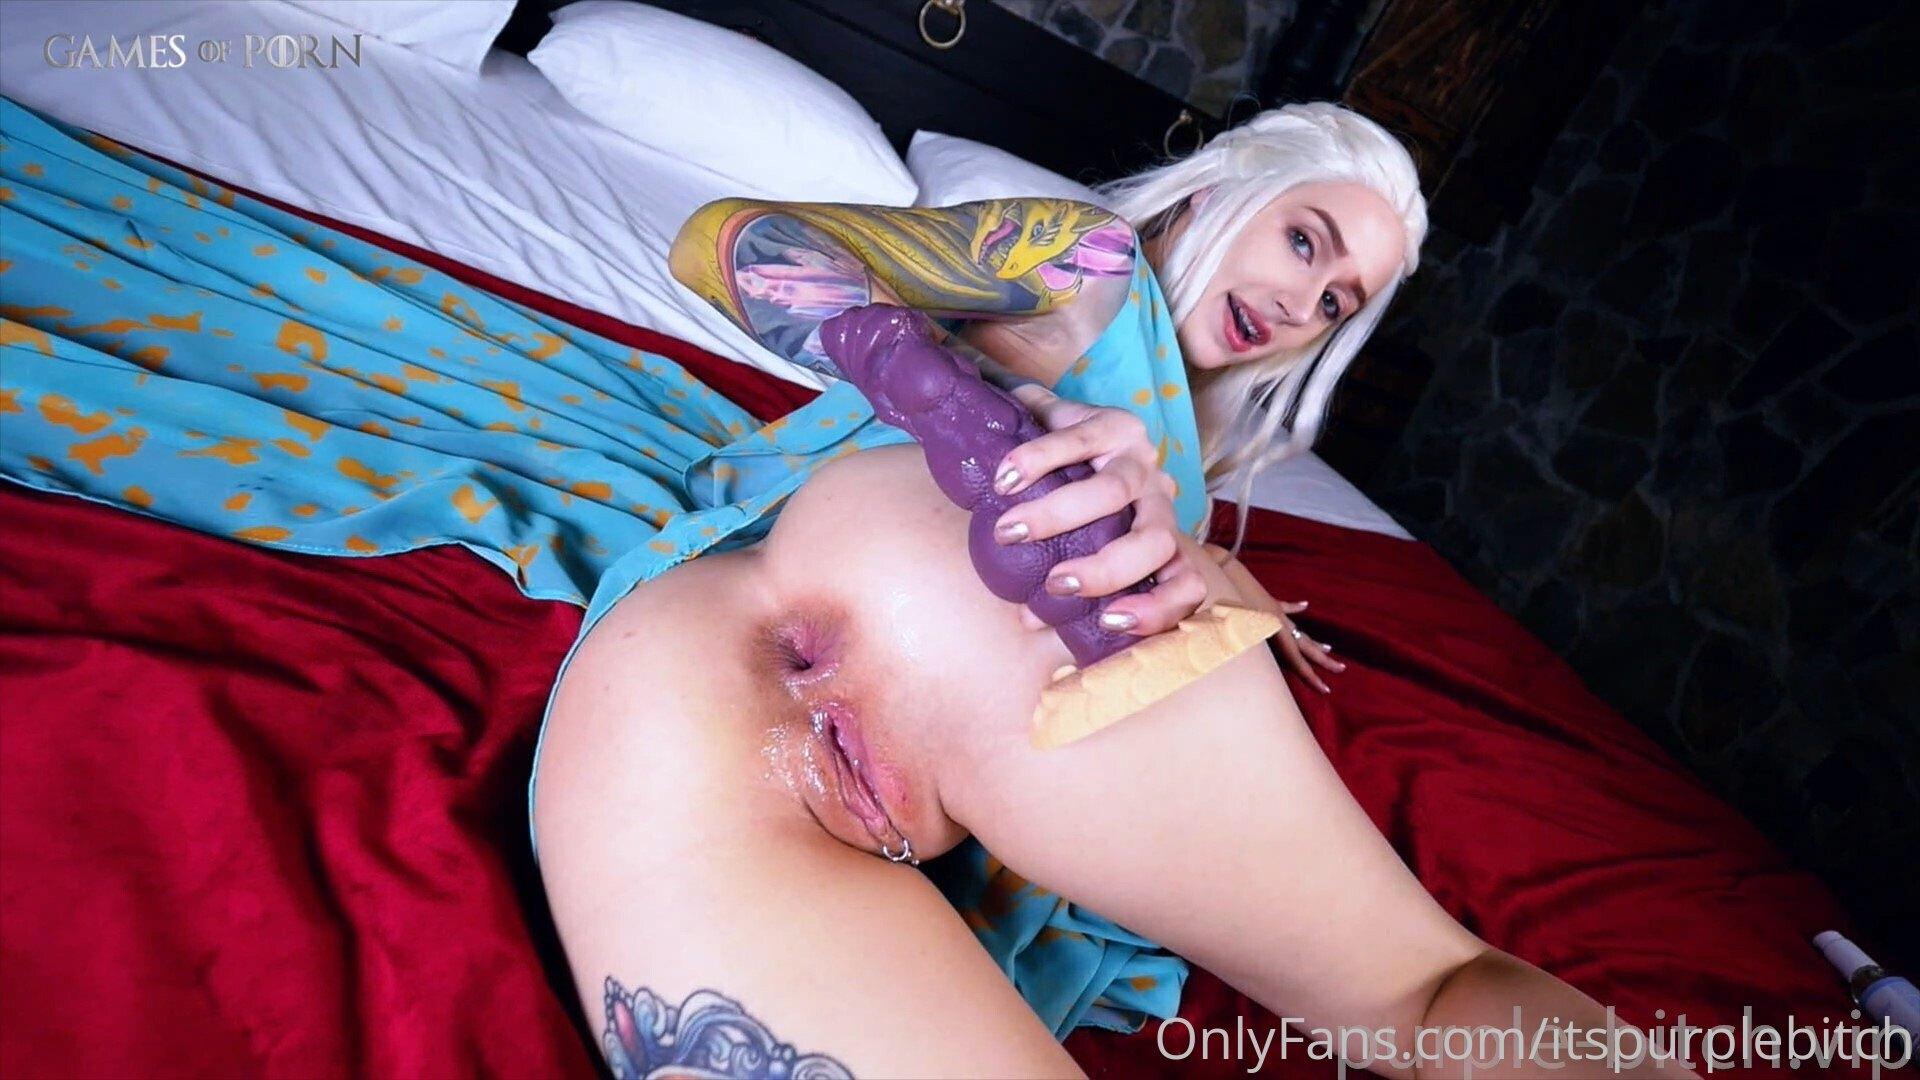 Onlyfans, Purple Bitch 0046